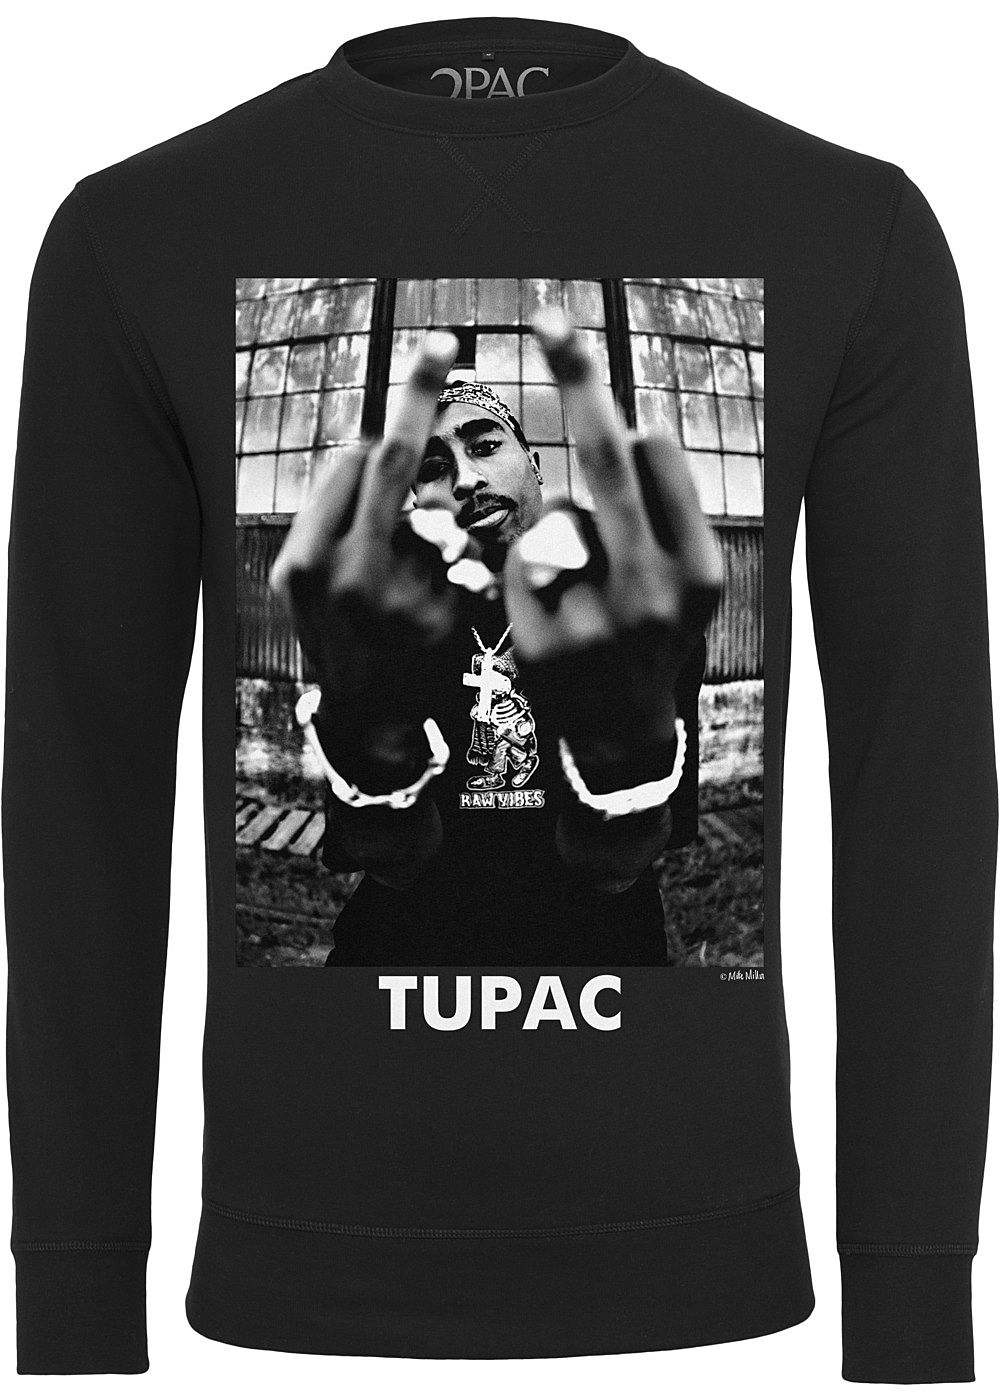 Mister Tee TB Herren Sweater Tupac Print schwarz 77onlineshop